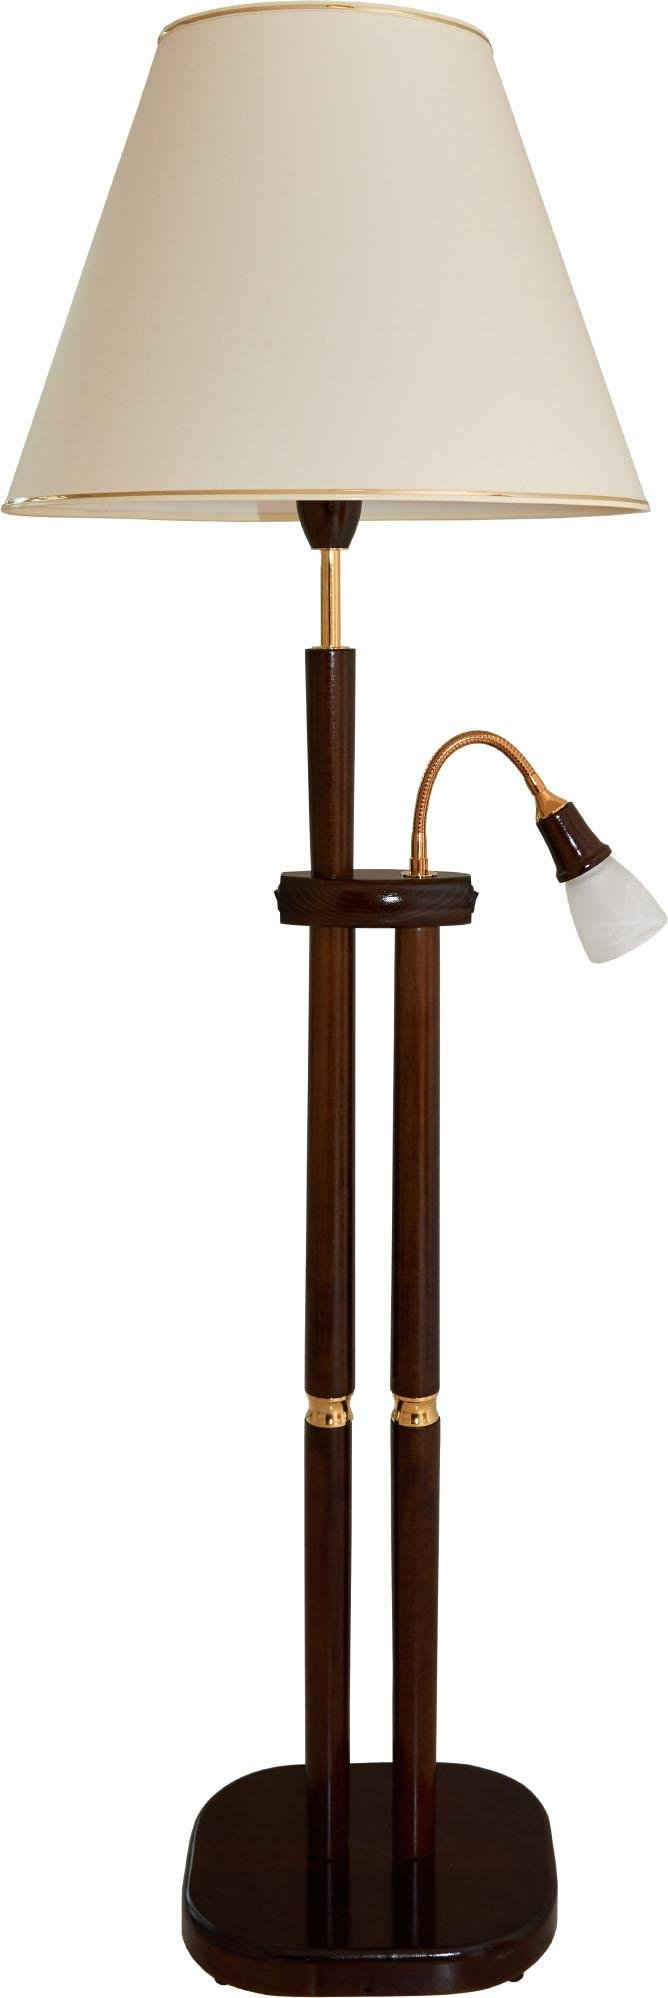 LED Stehlampe »8652/S«, mit Leseleuchte